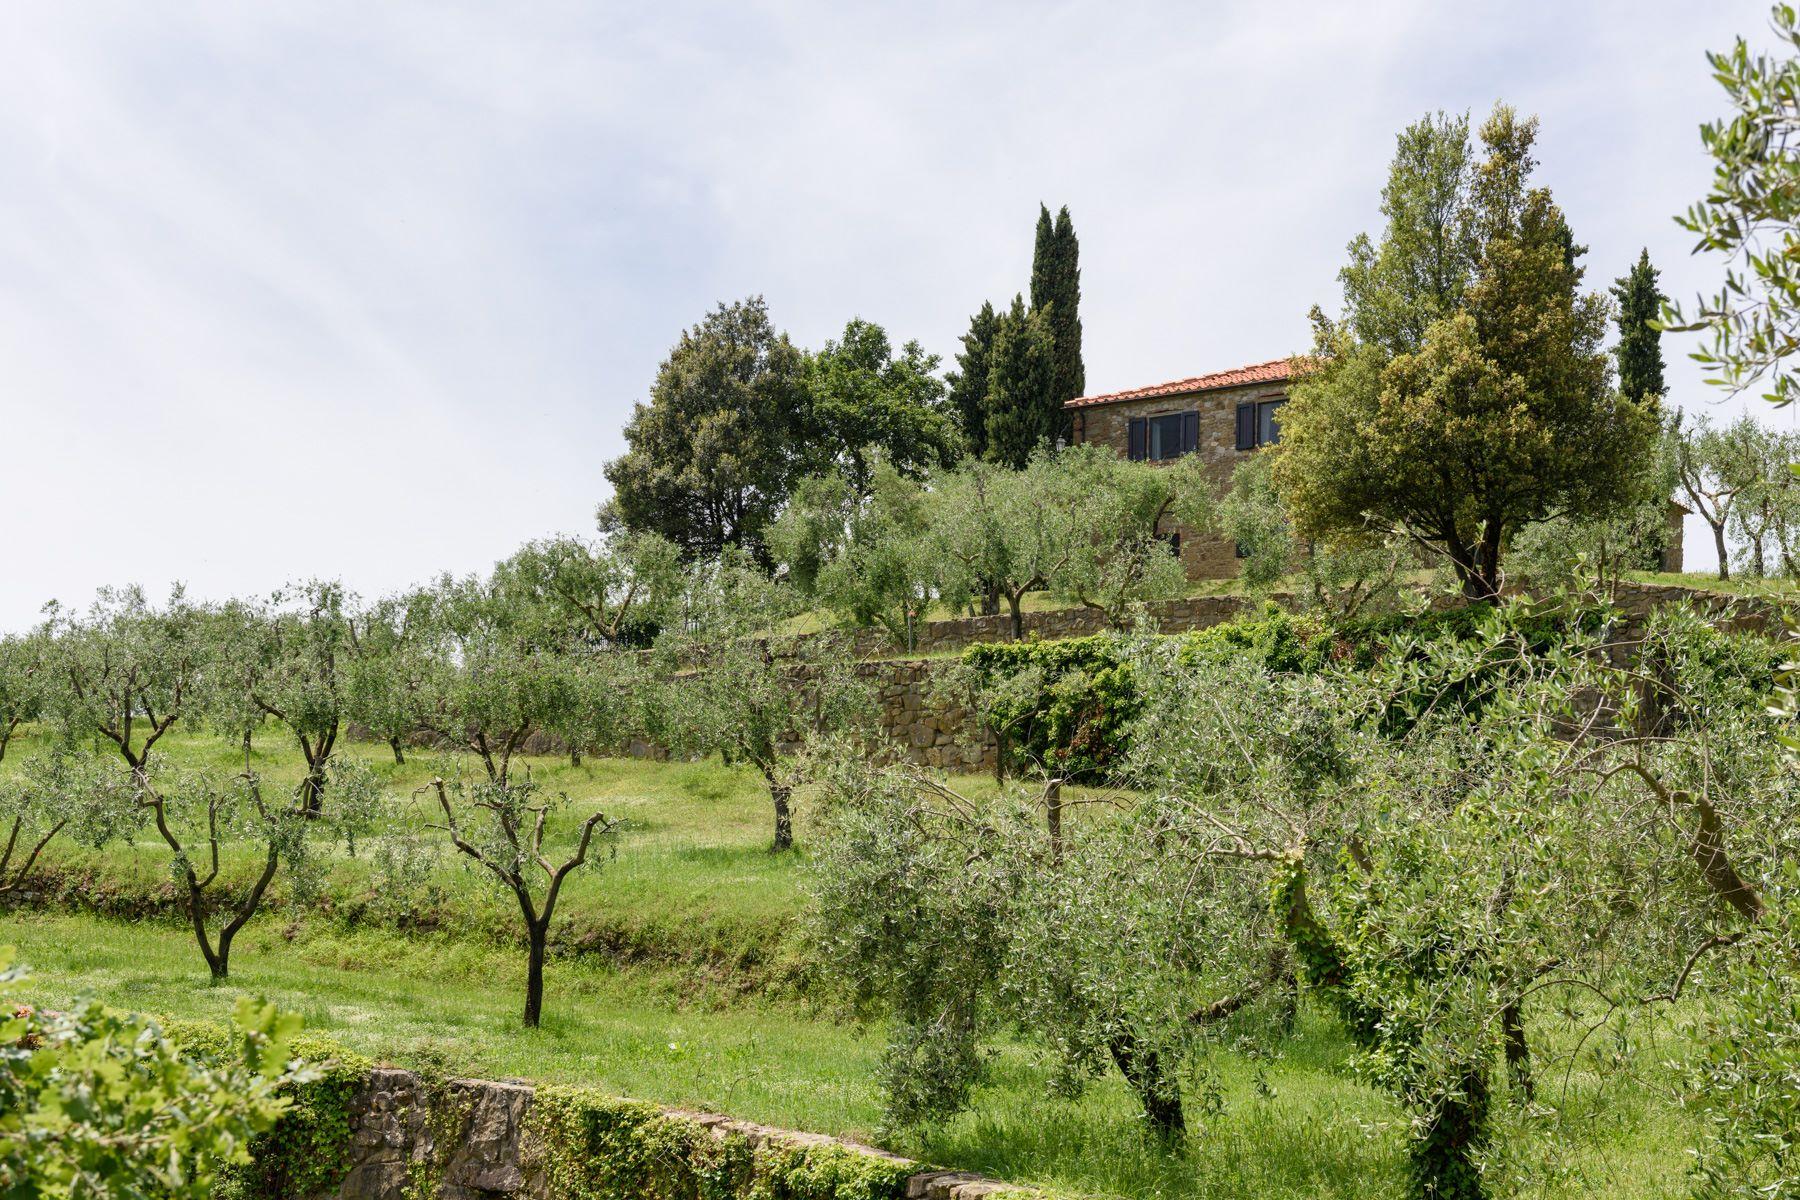 Additional photo for property listing at Country retreat in Chianti Aretino Pergine Valdarno, Arezzo Italy